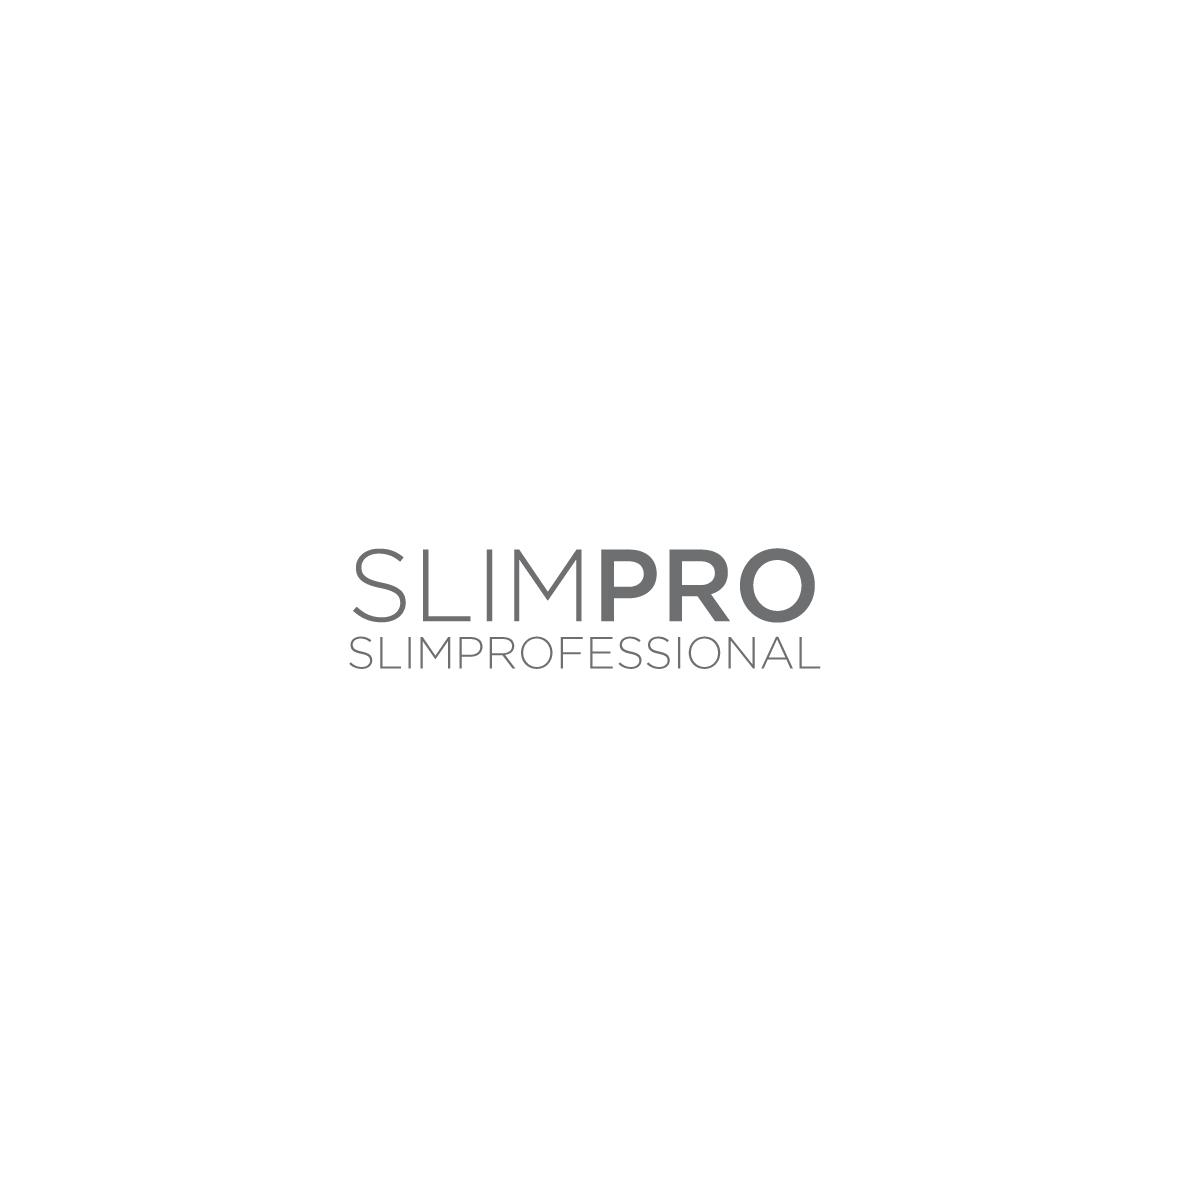 SLIMPROFESSIONAL